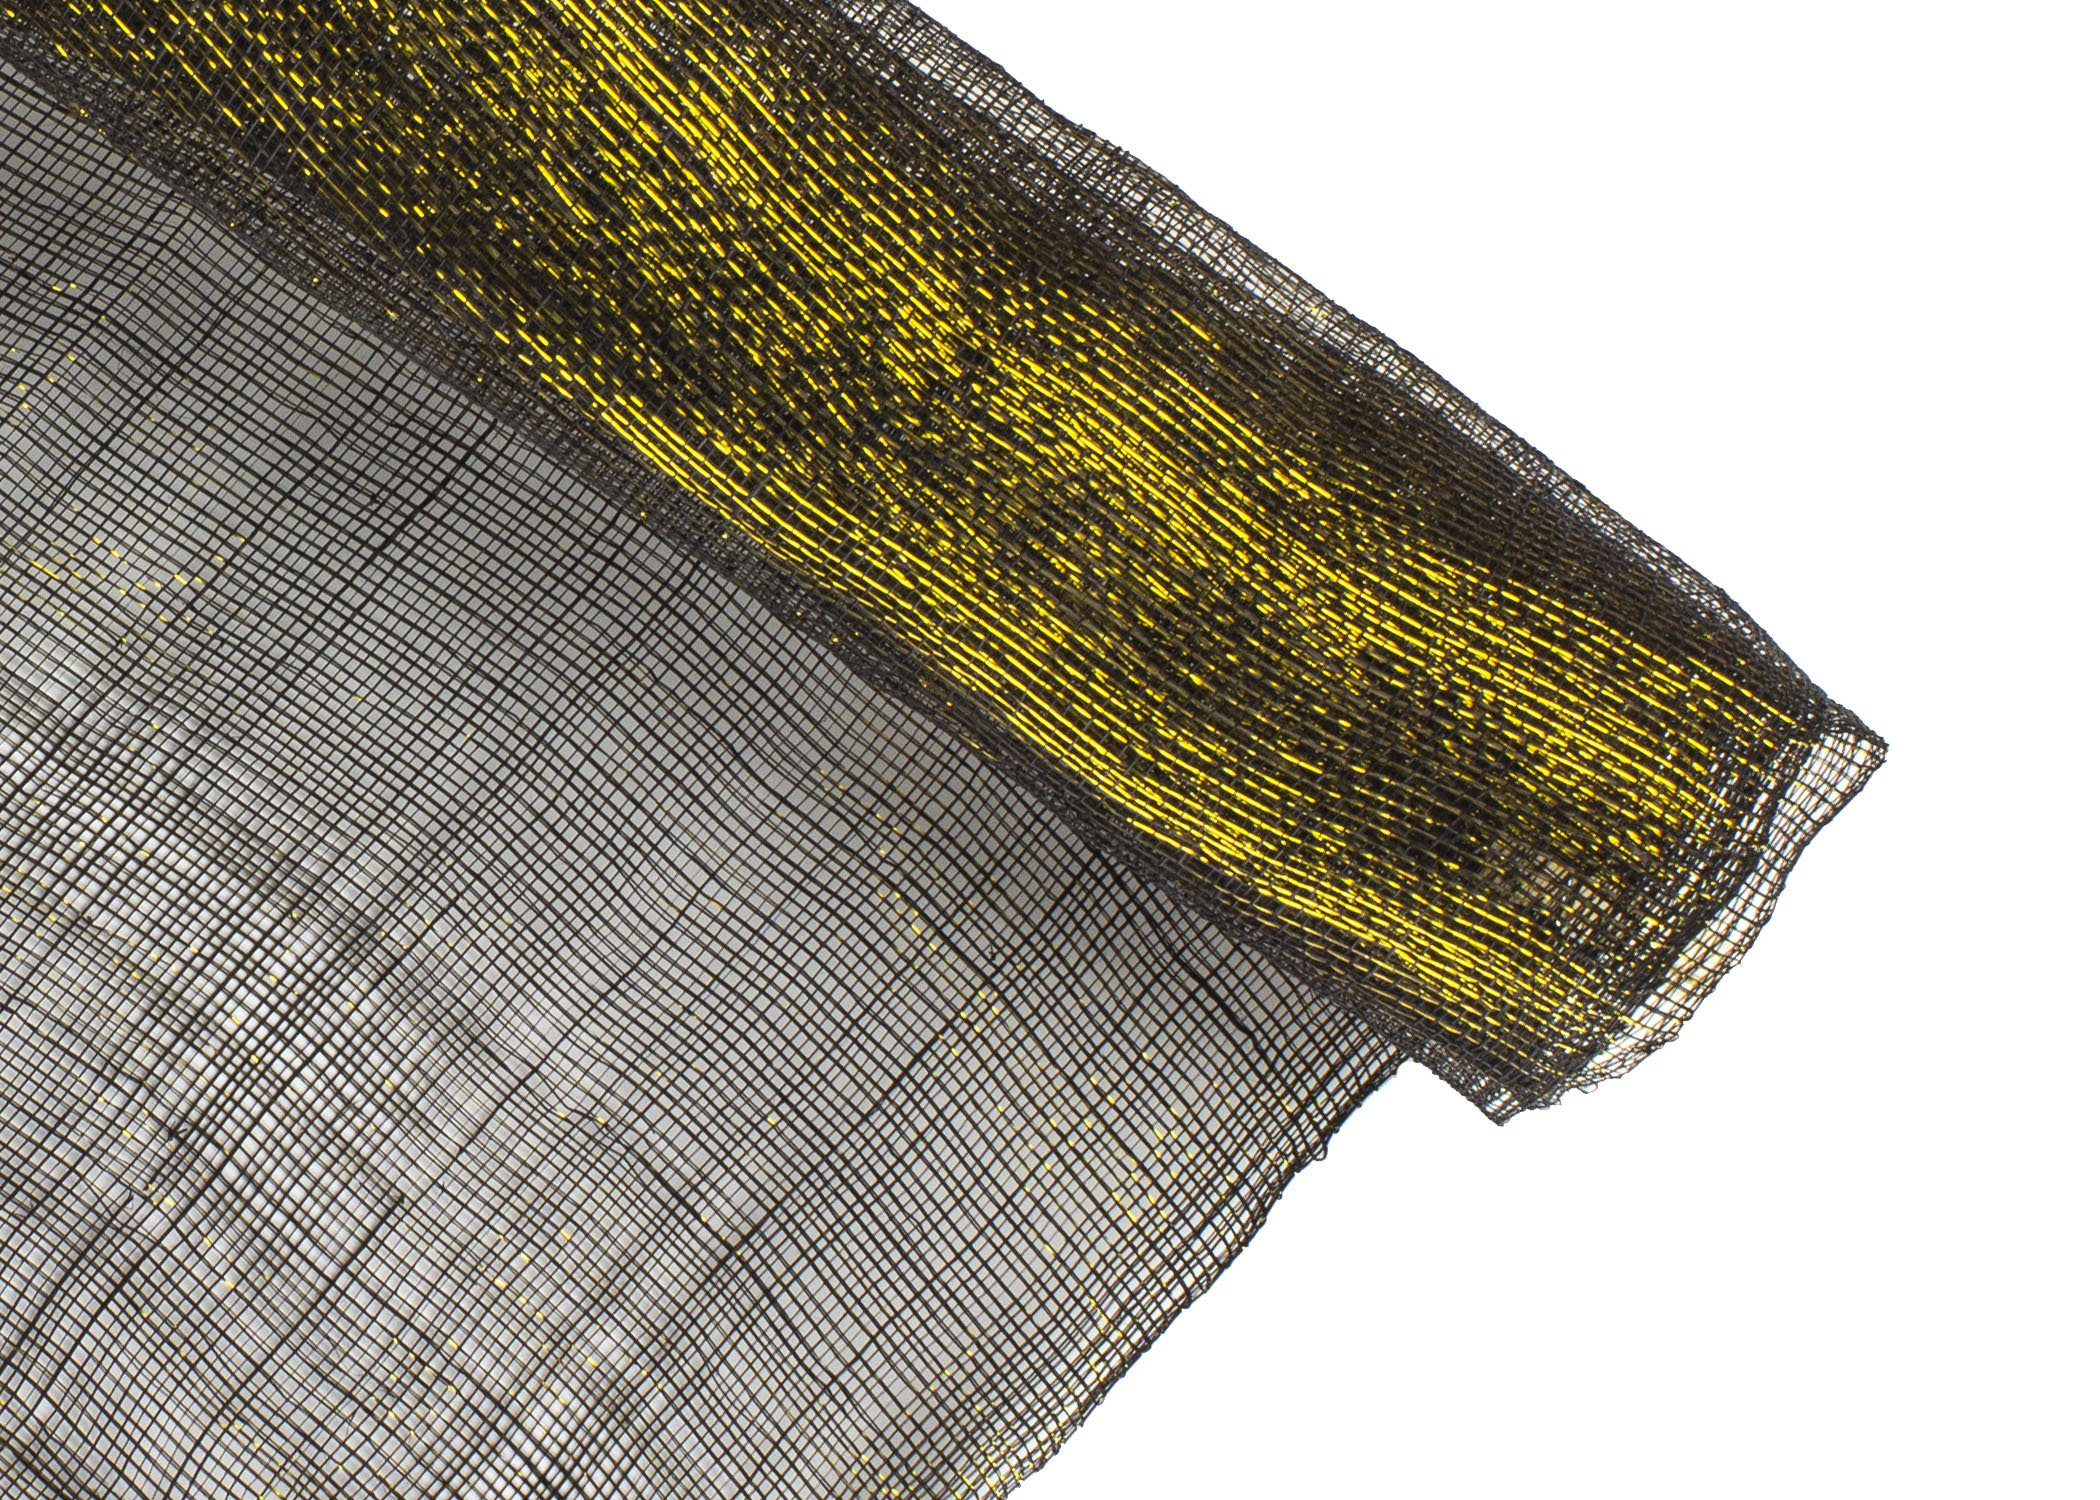 1 Meter x 90cm Brown Stiffened Sinamay Millinery Fabric